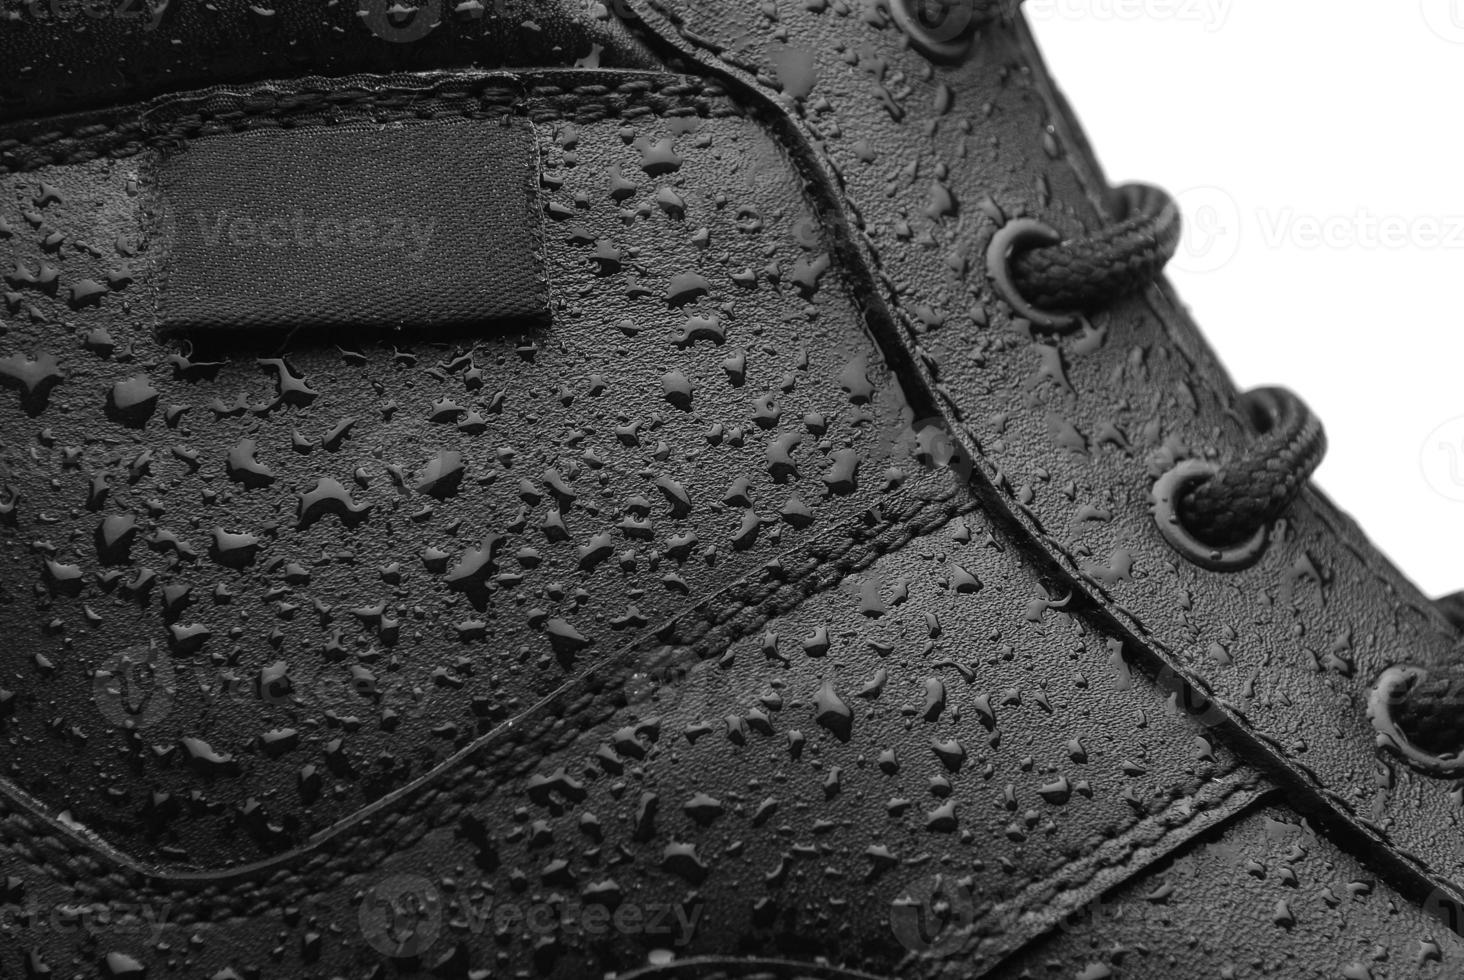 waterdichte schoen foto